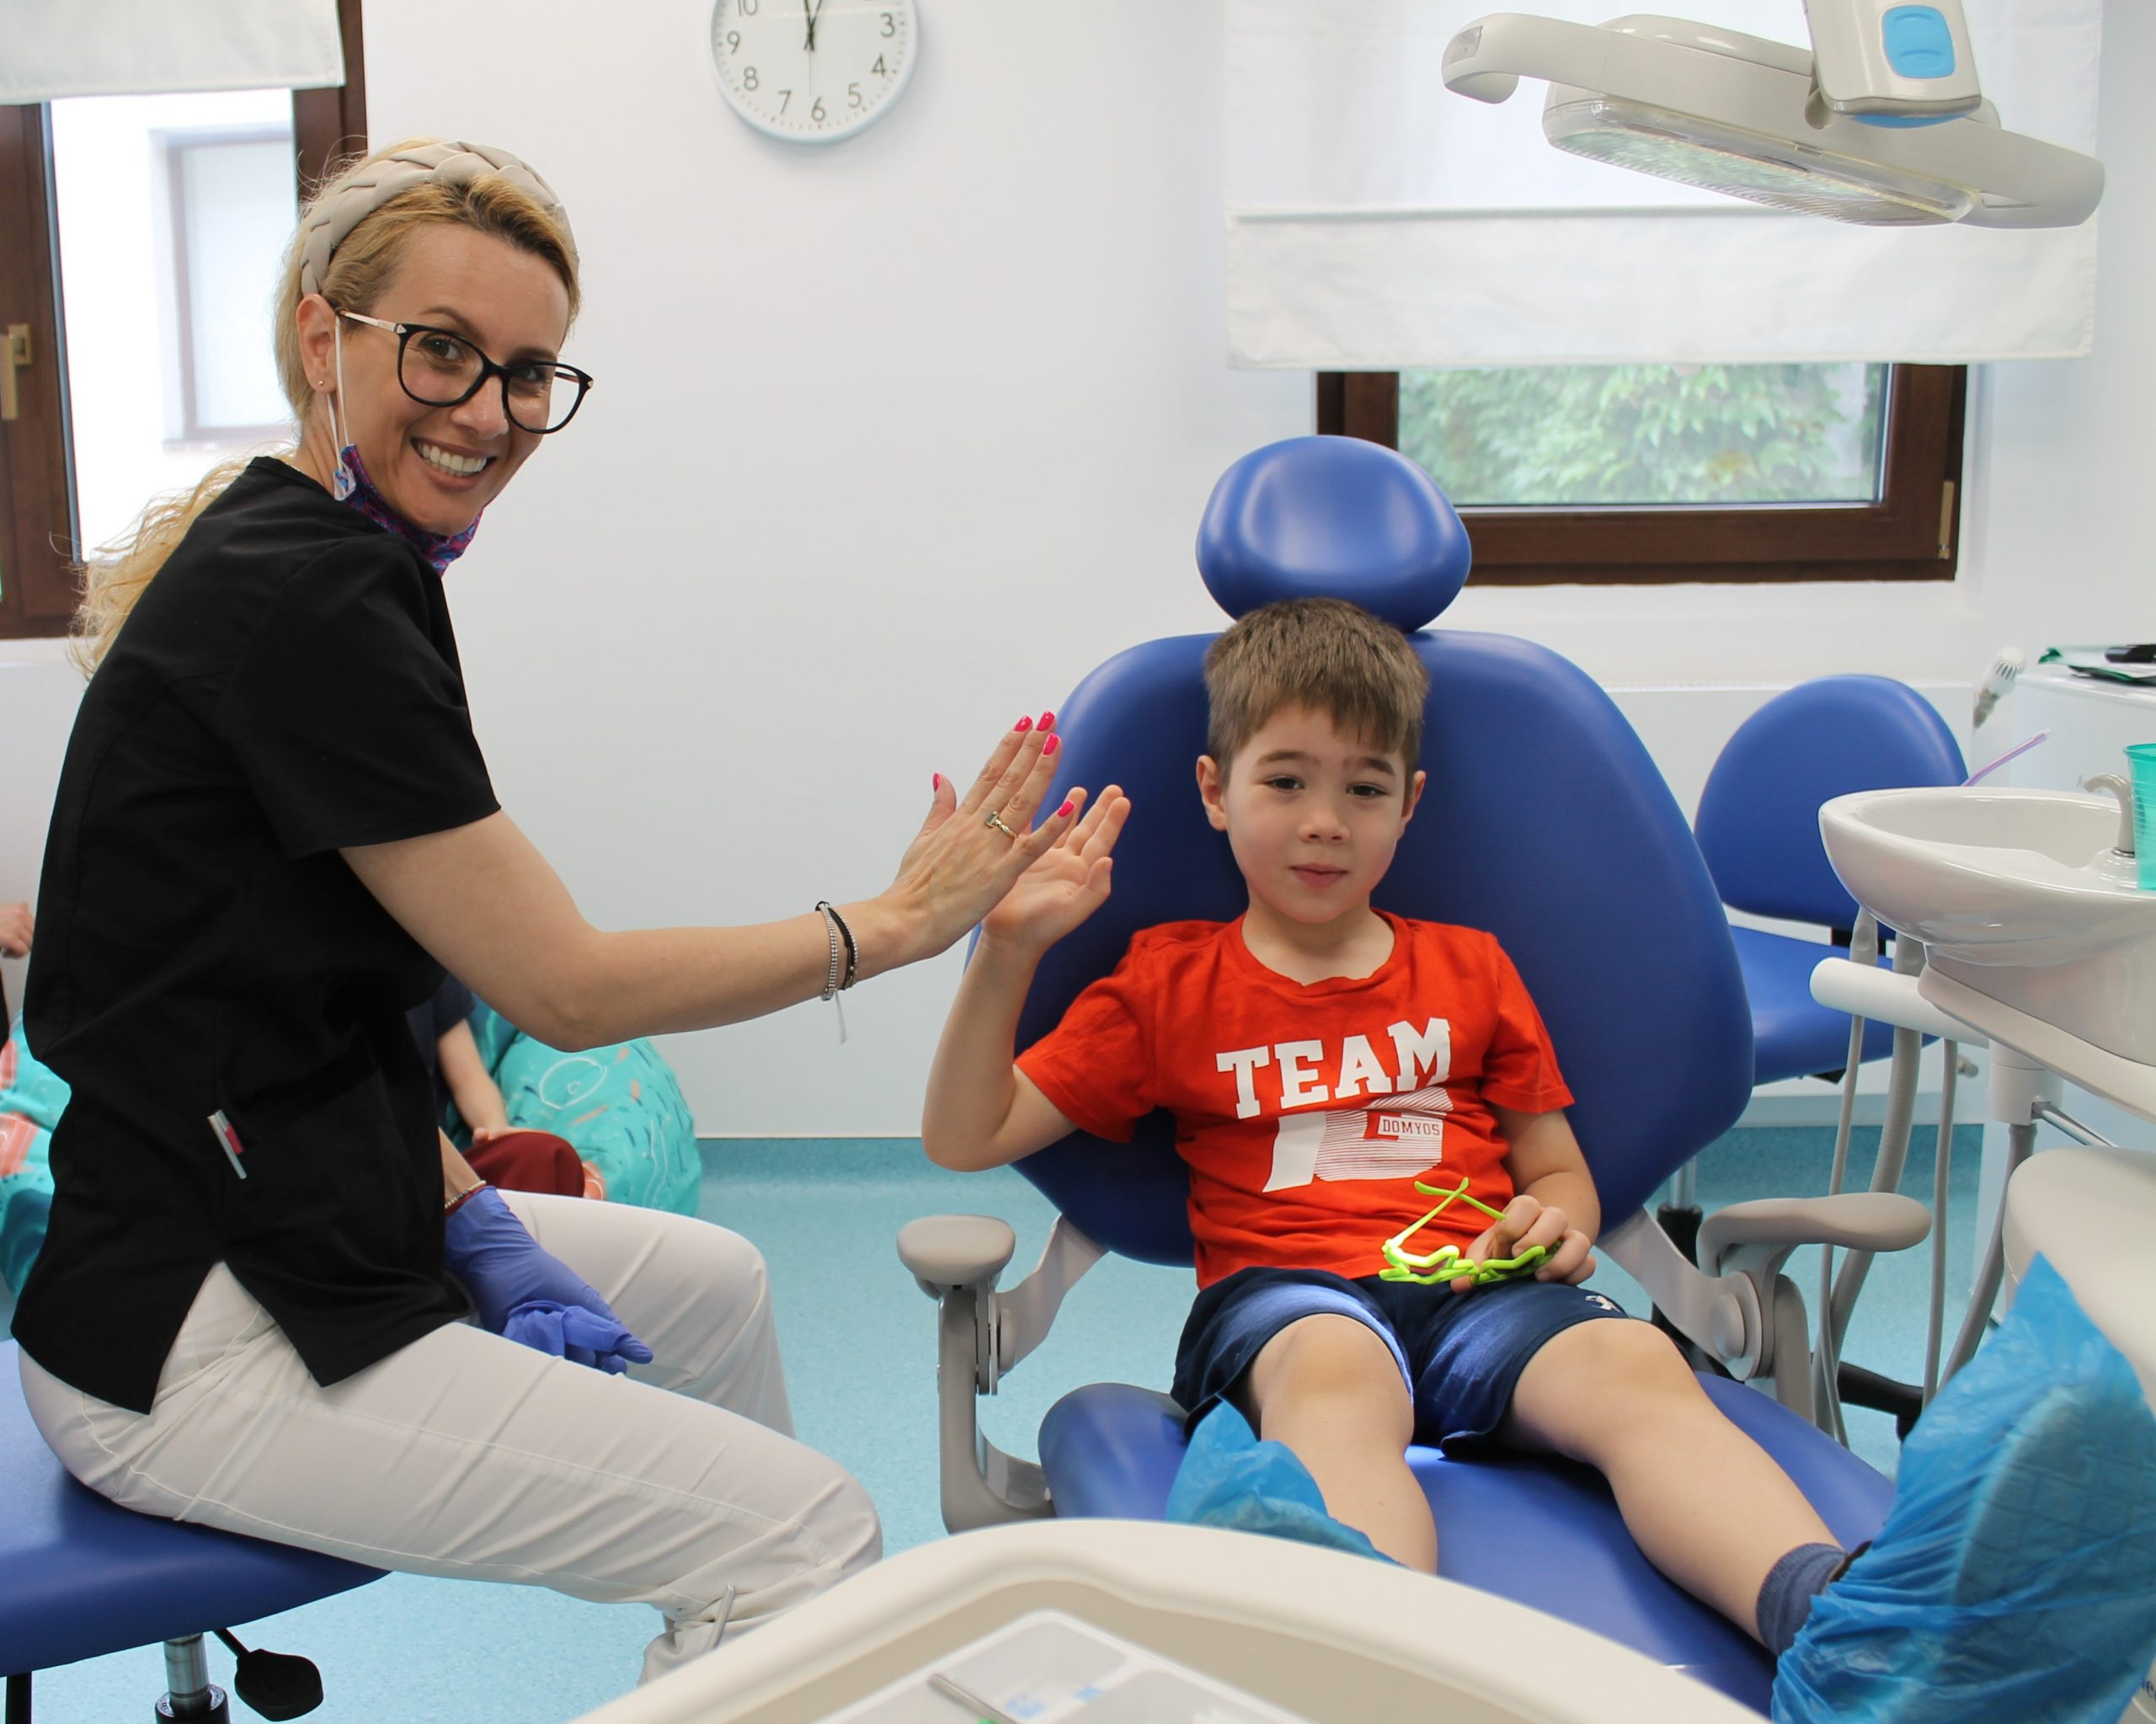 Dr. Mihaela Parlog in stanga pe scaun bate palma cu pacientul din dreapta, pe scaunul stomatologic